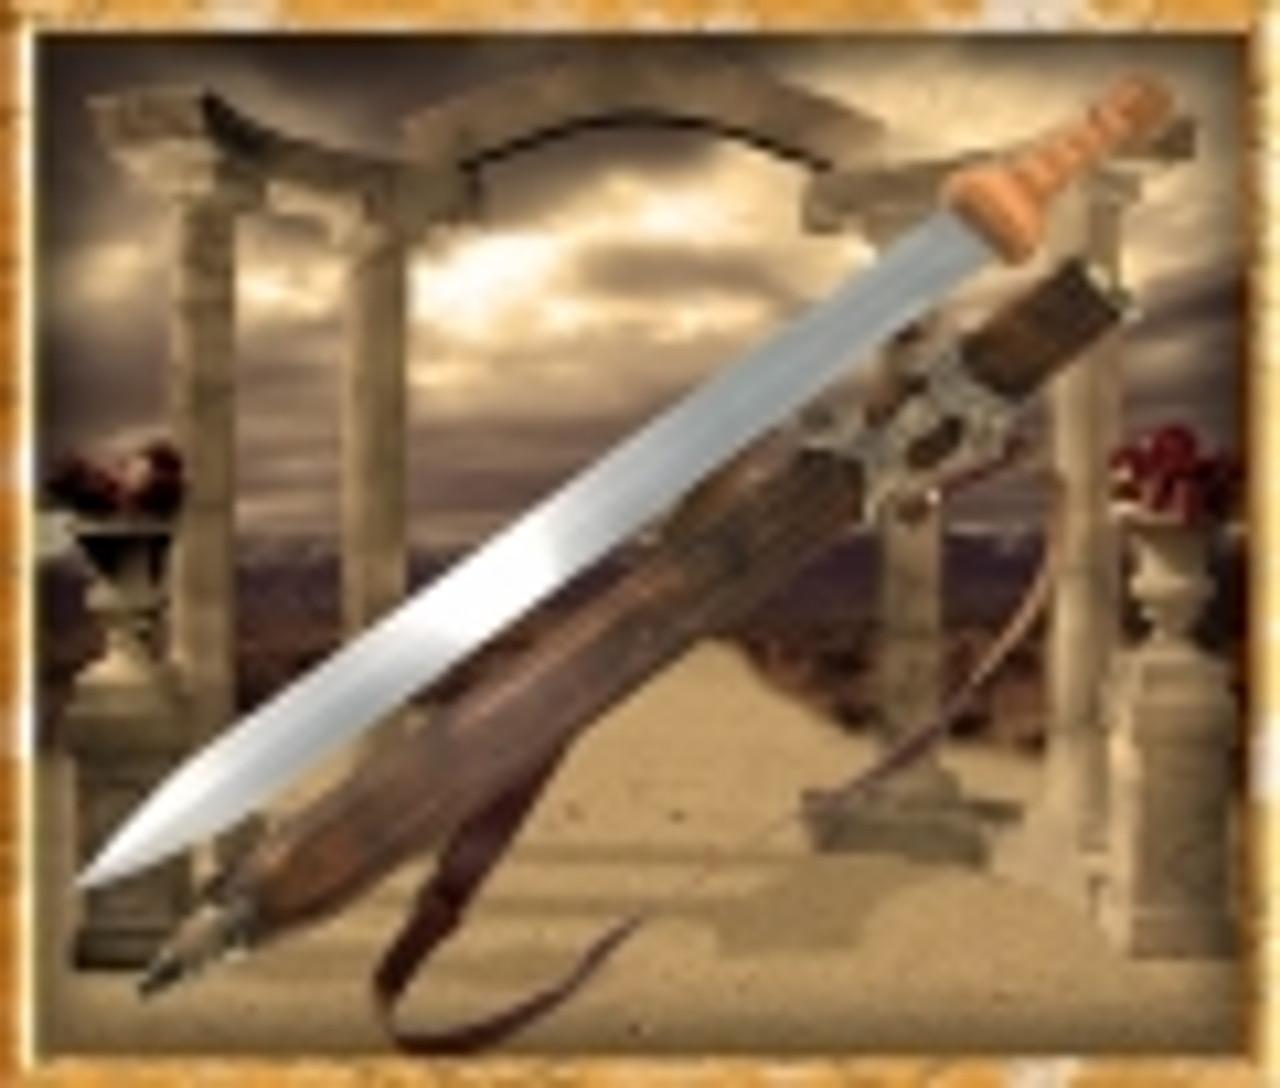 Gladiator Props